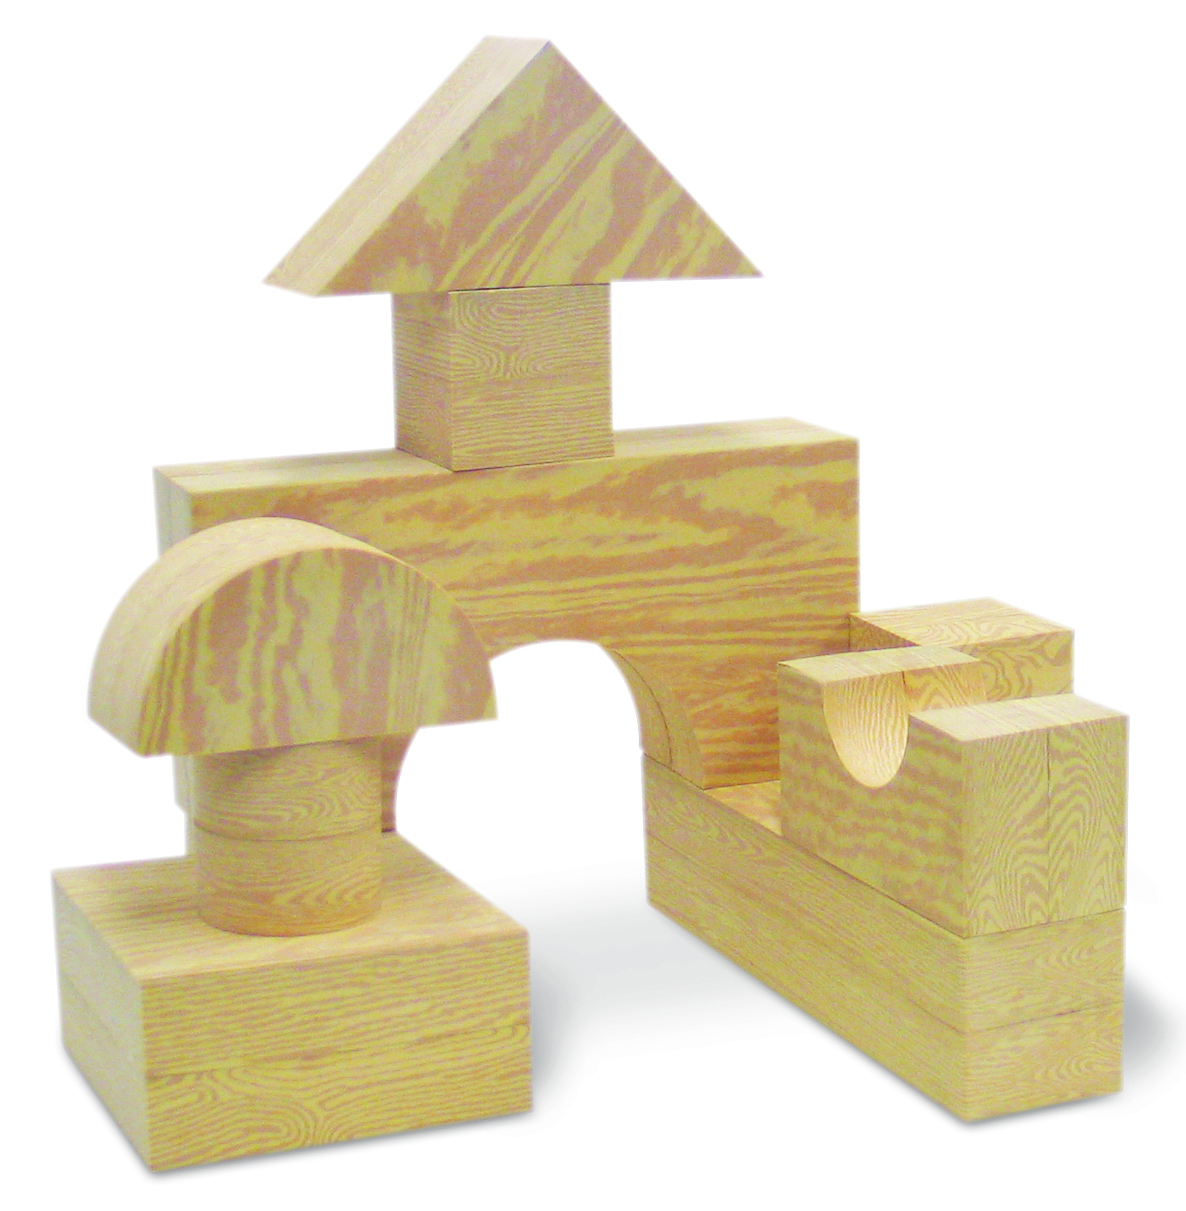 Edushape Big Wood-Like Blocks, 32-Piece by Edushape